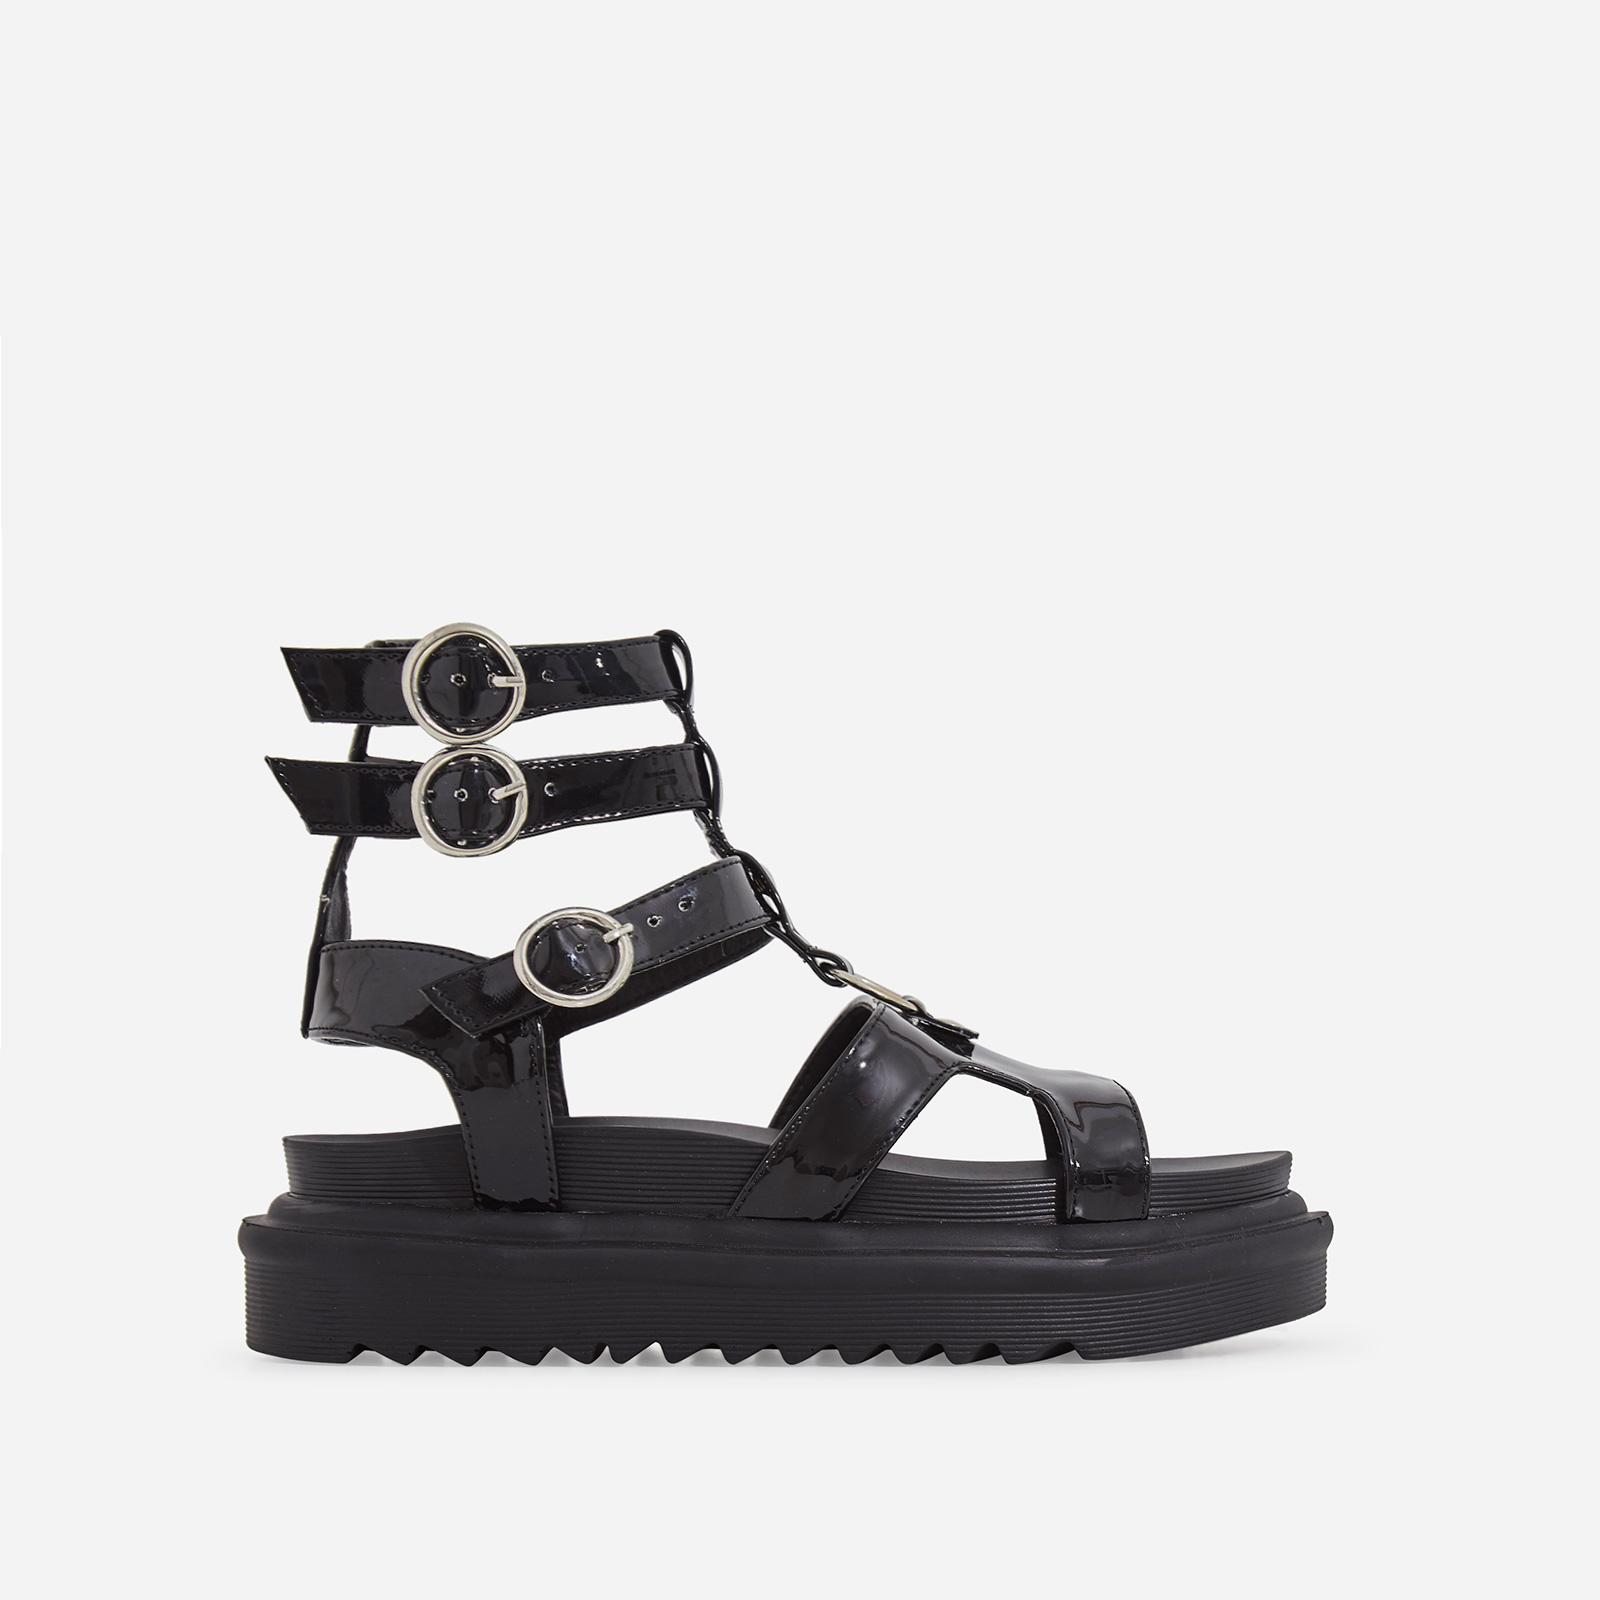 Gladys Chunky Sole Gladiator Sandal In Black Patent